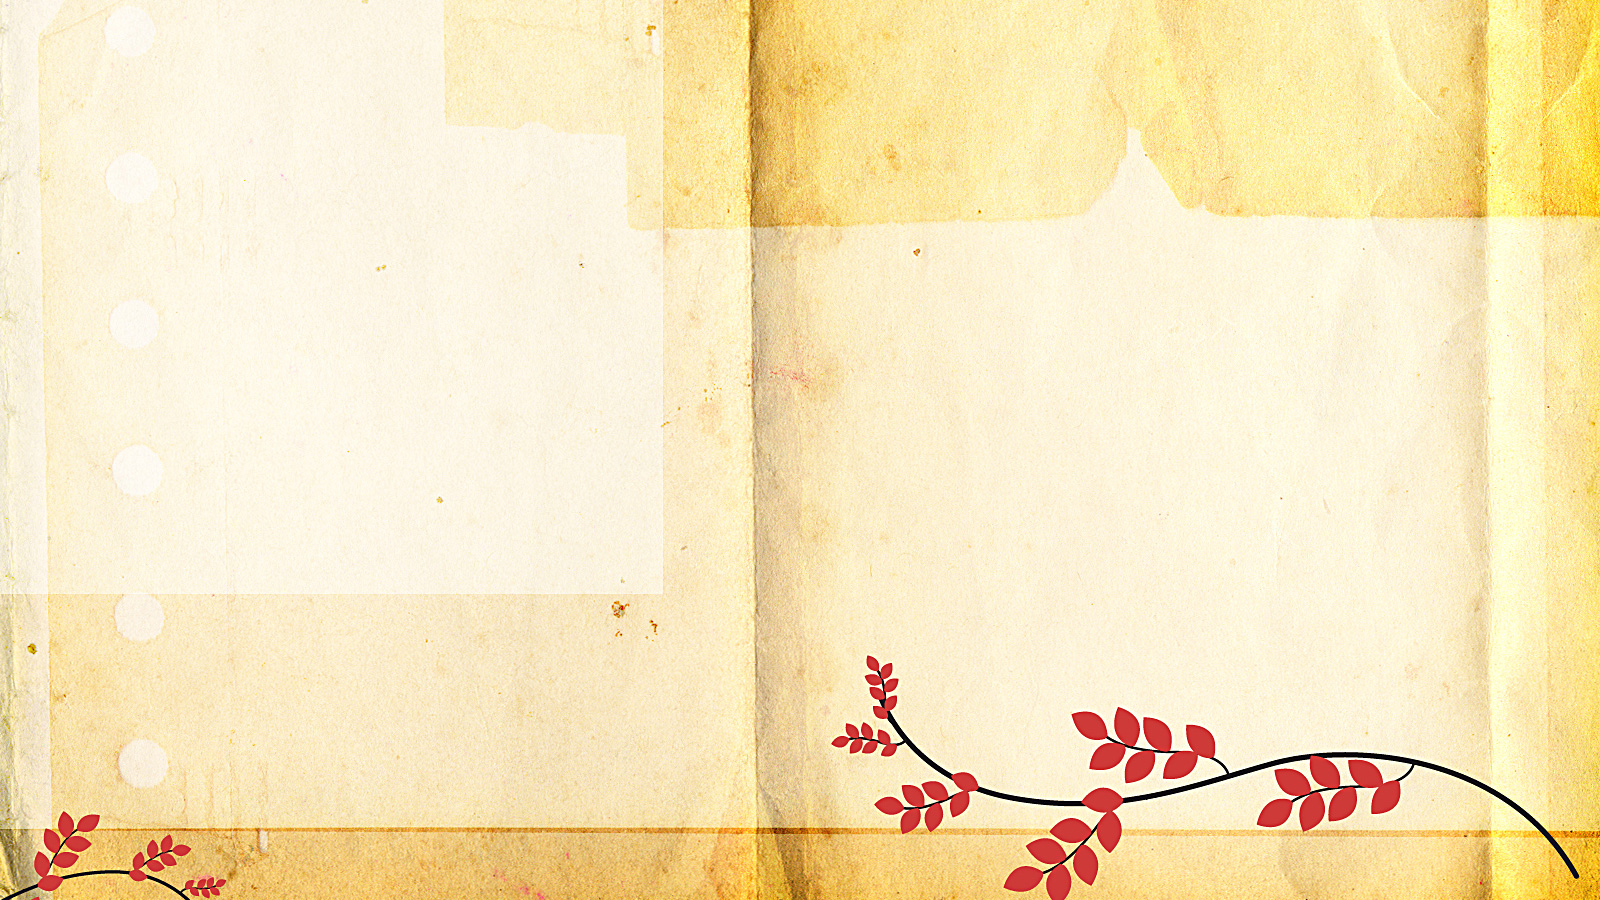 Vintage Paper Background in HD